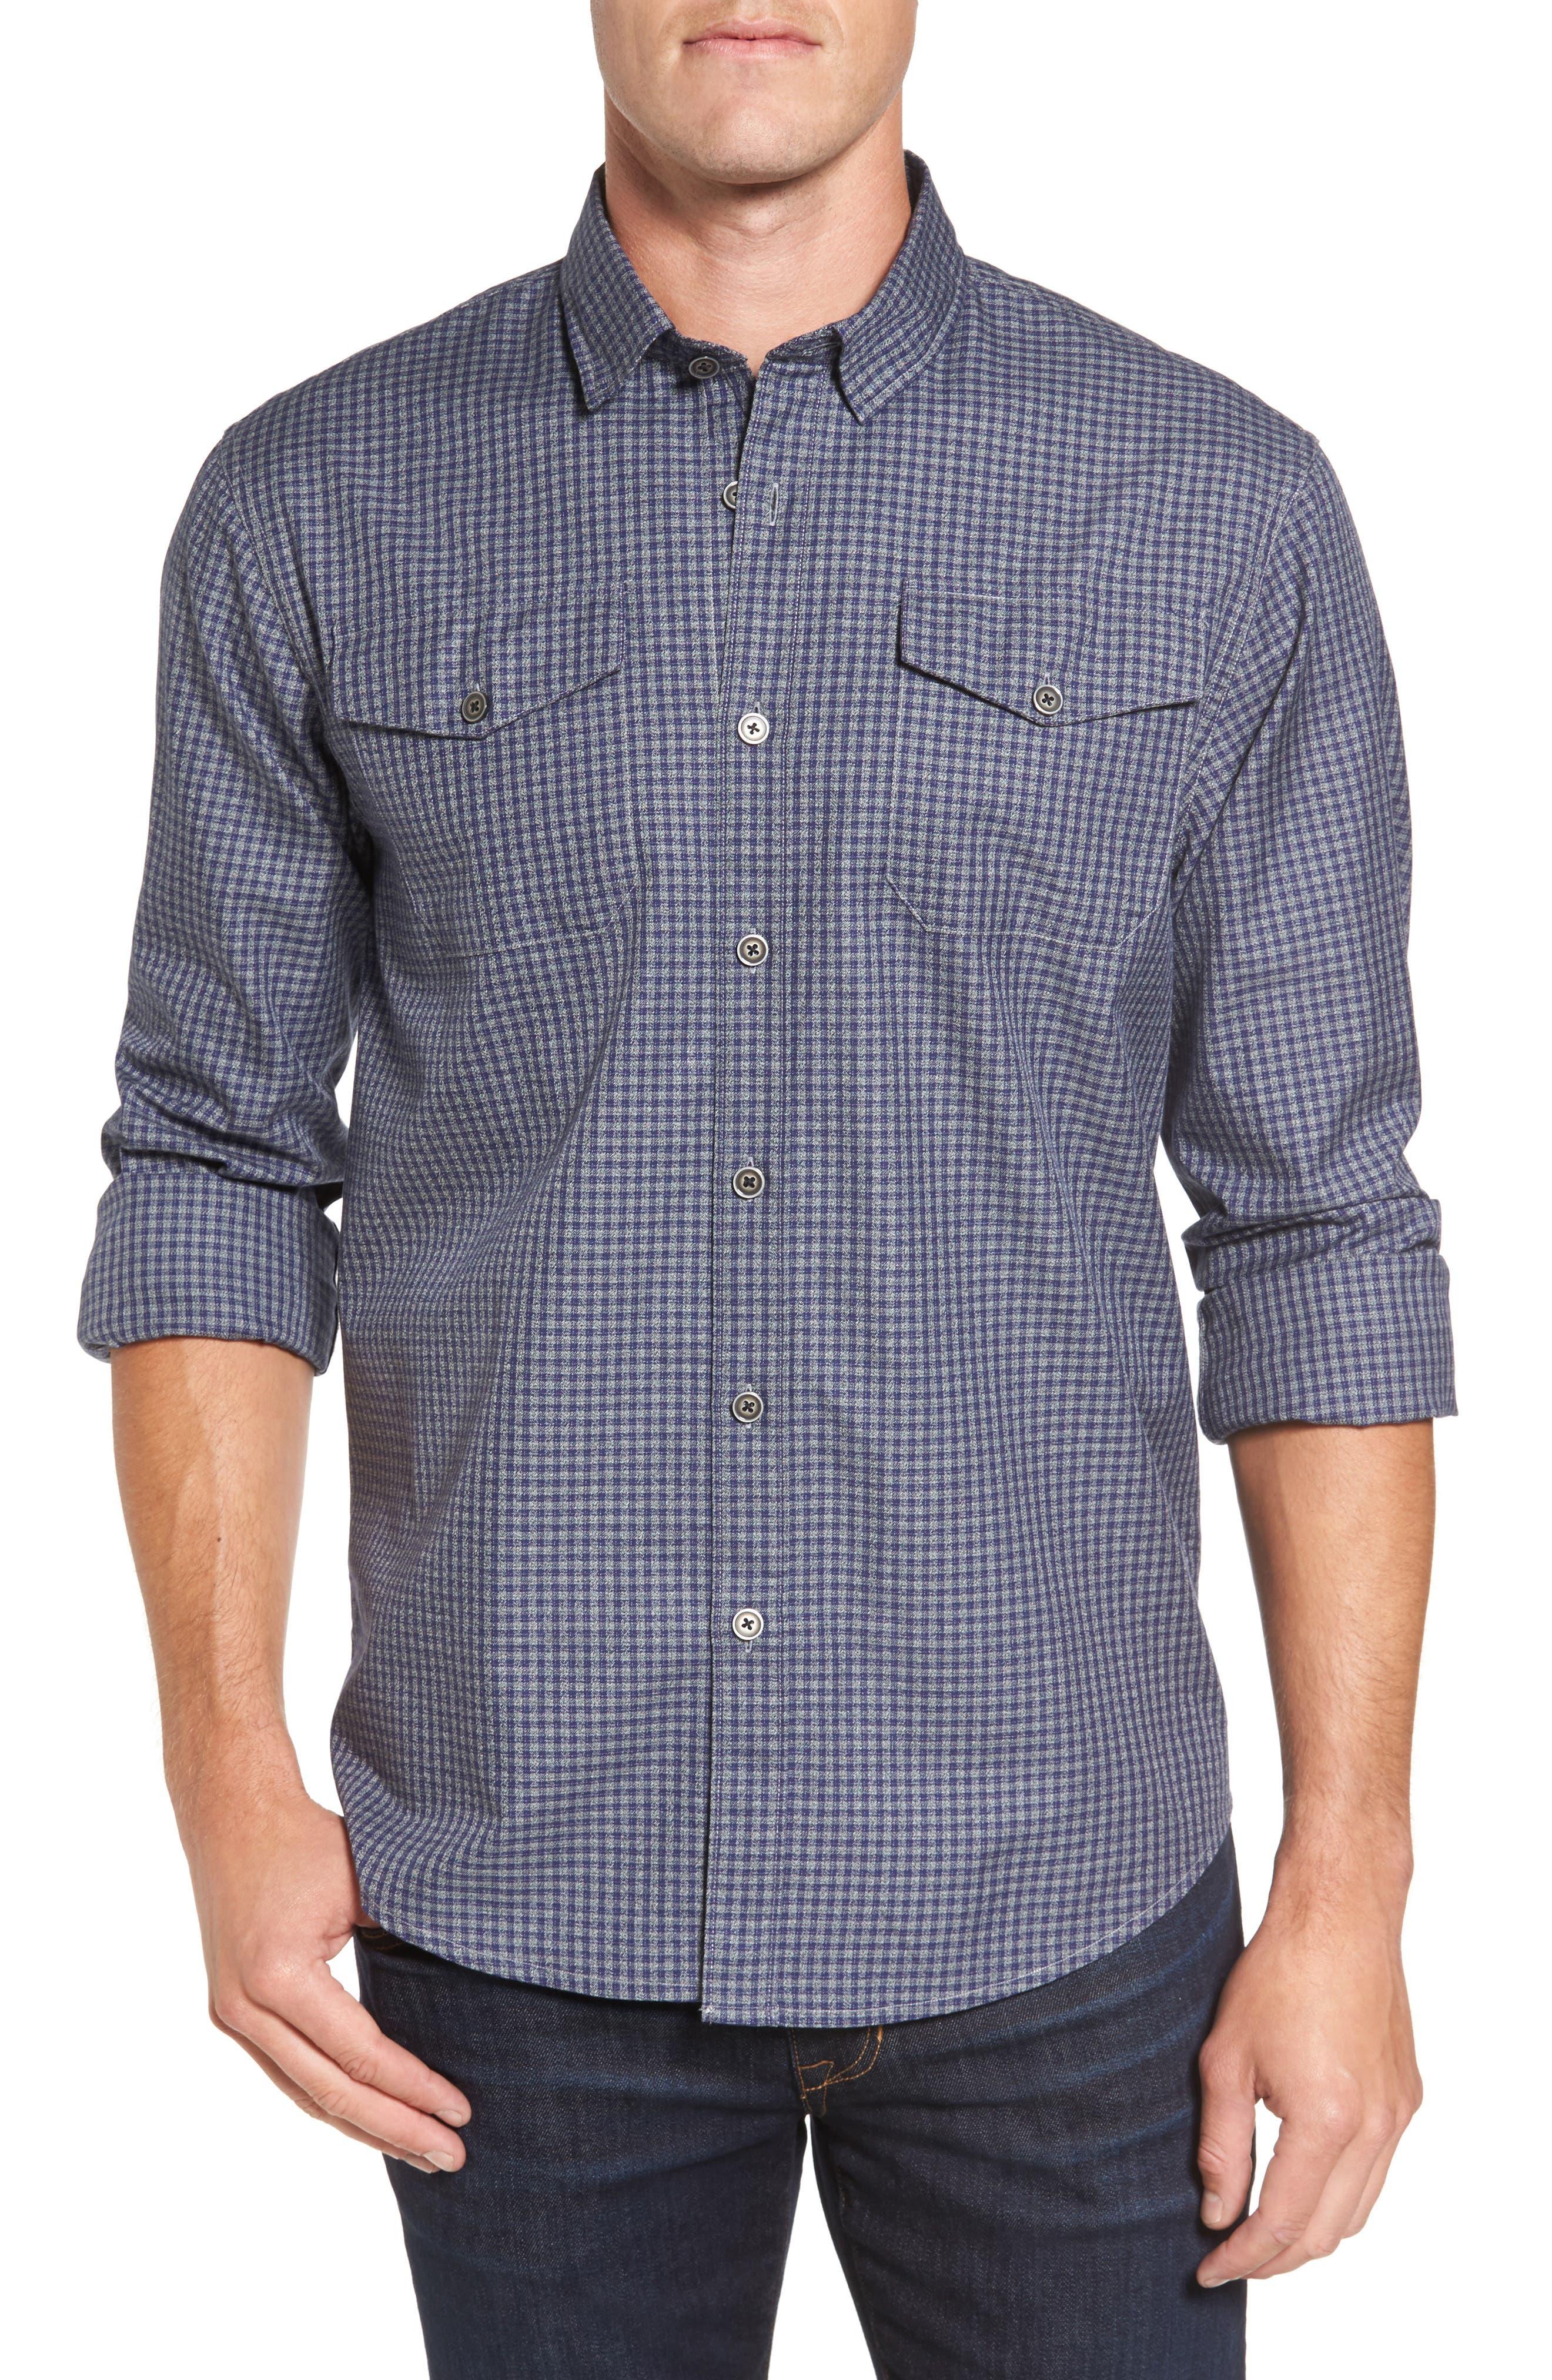 Main Image - Coastaoro Main Street Check Flannel Shirt